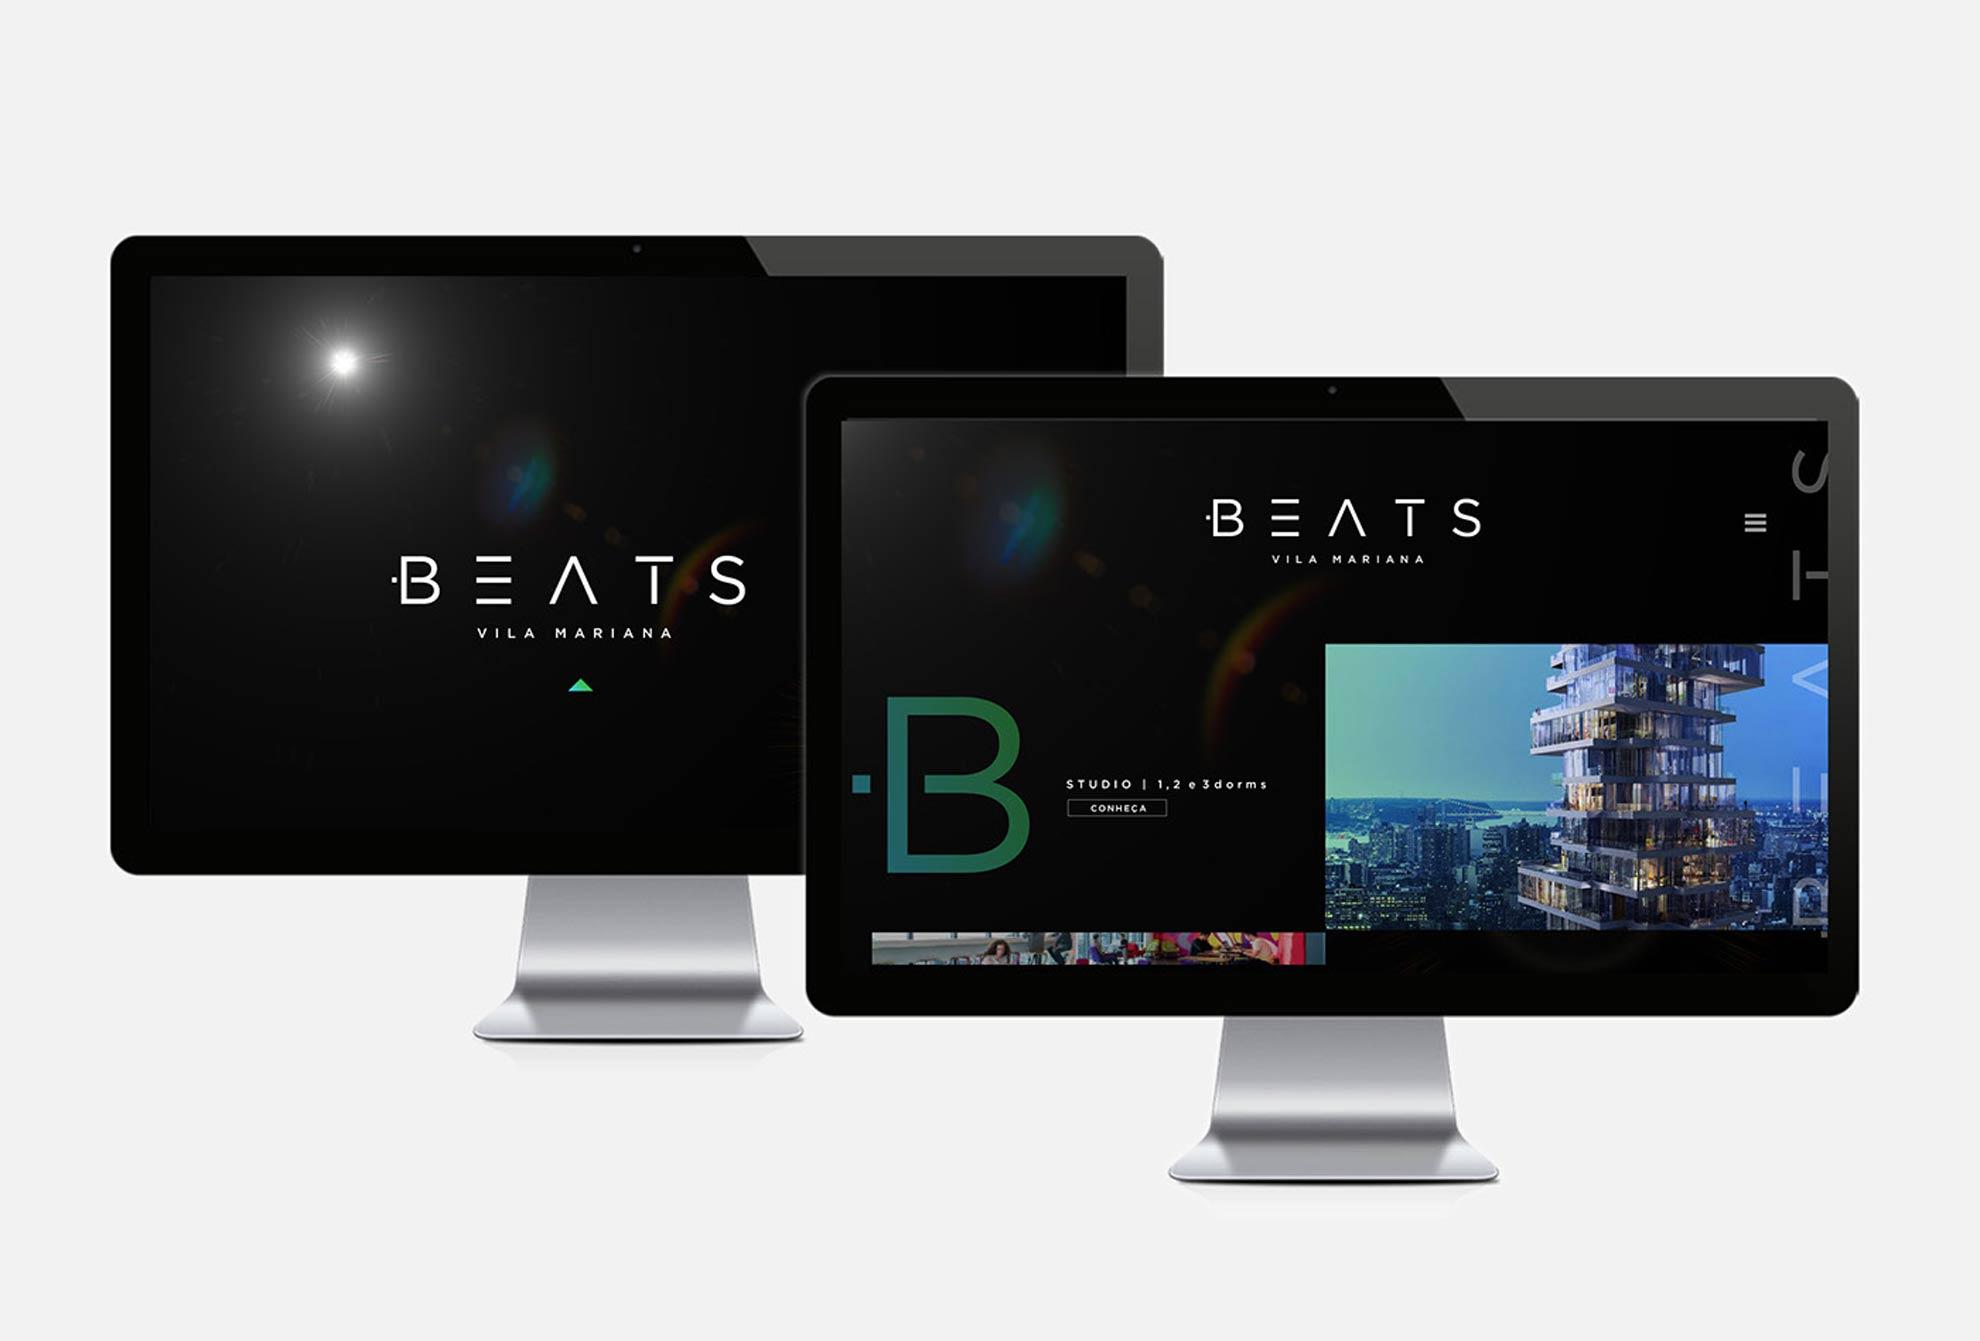 beats-ramonmaia-design-portfolio_4